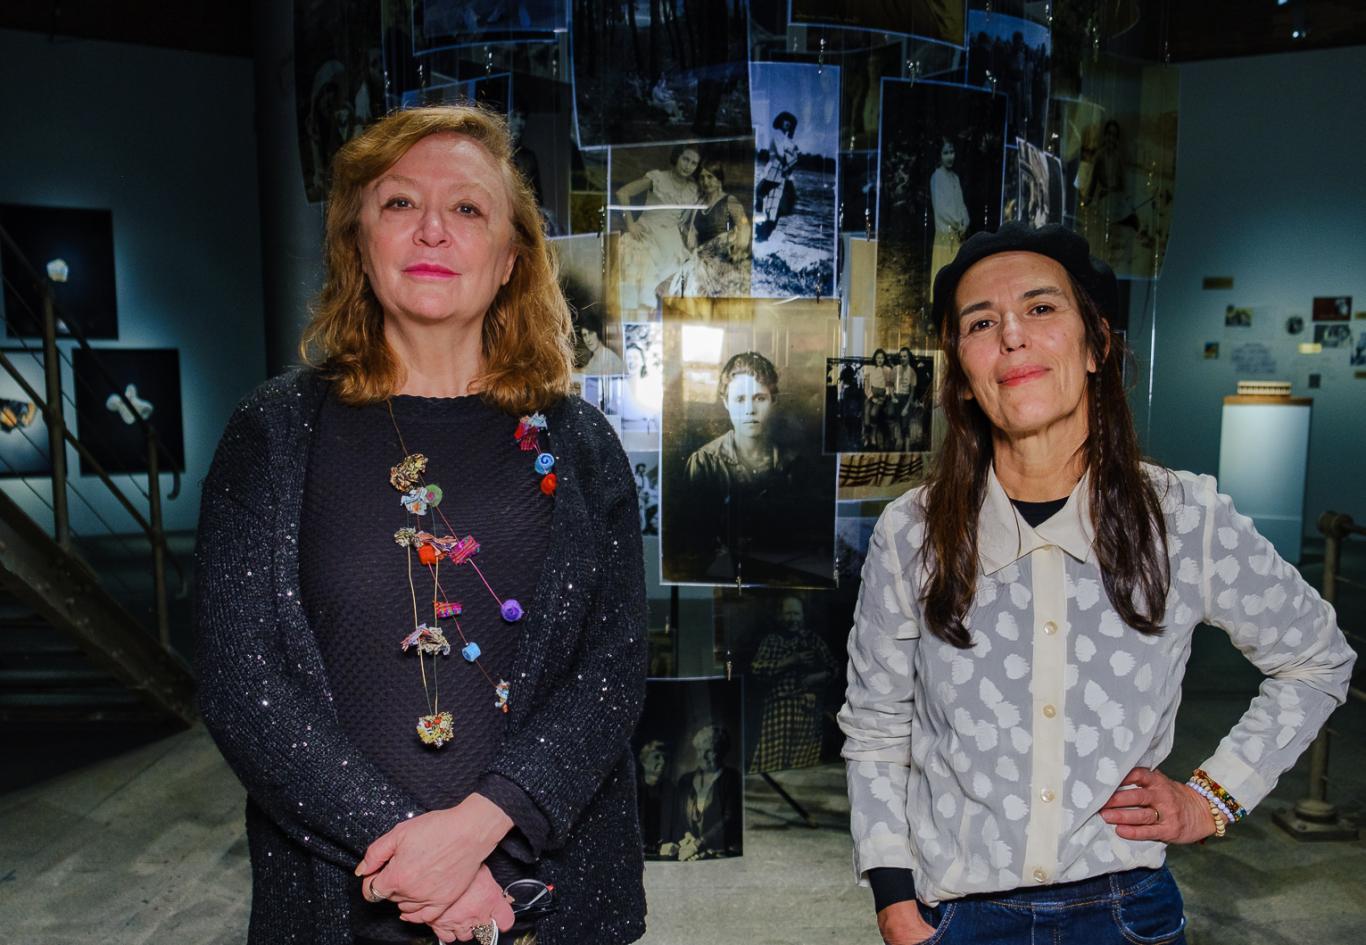 Retrato de la comisaria y de la fotógrafa dentro de la sala canal